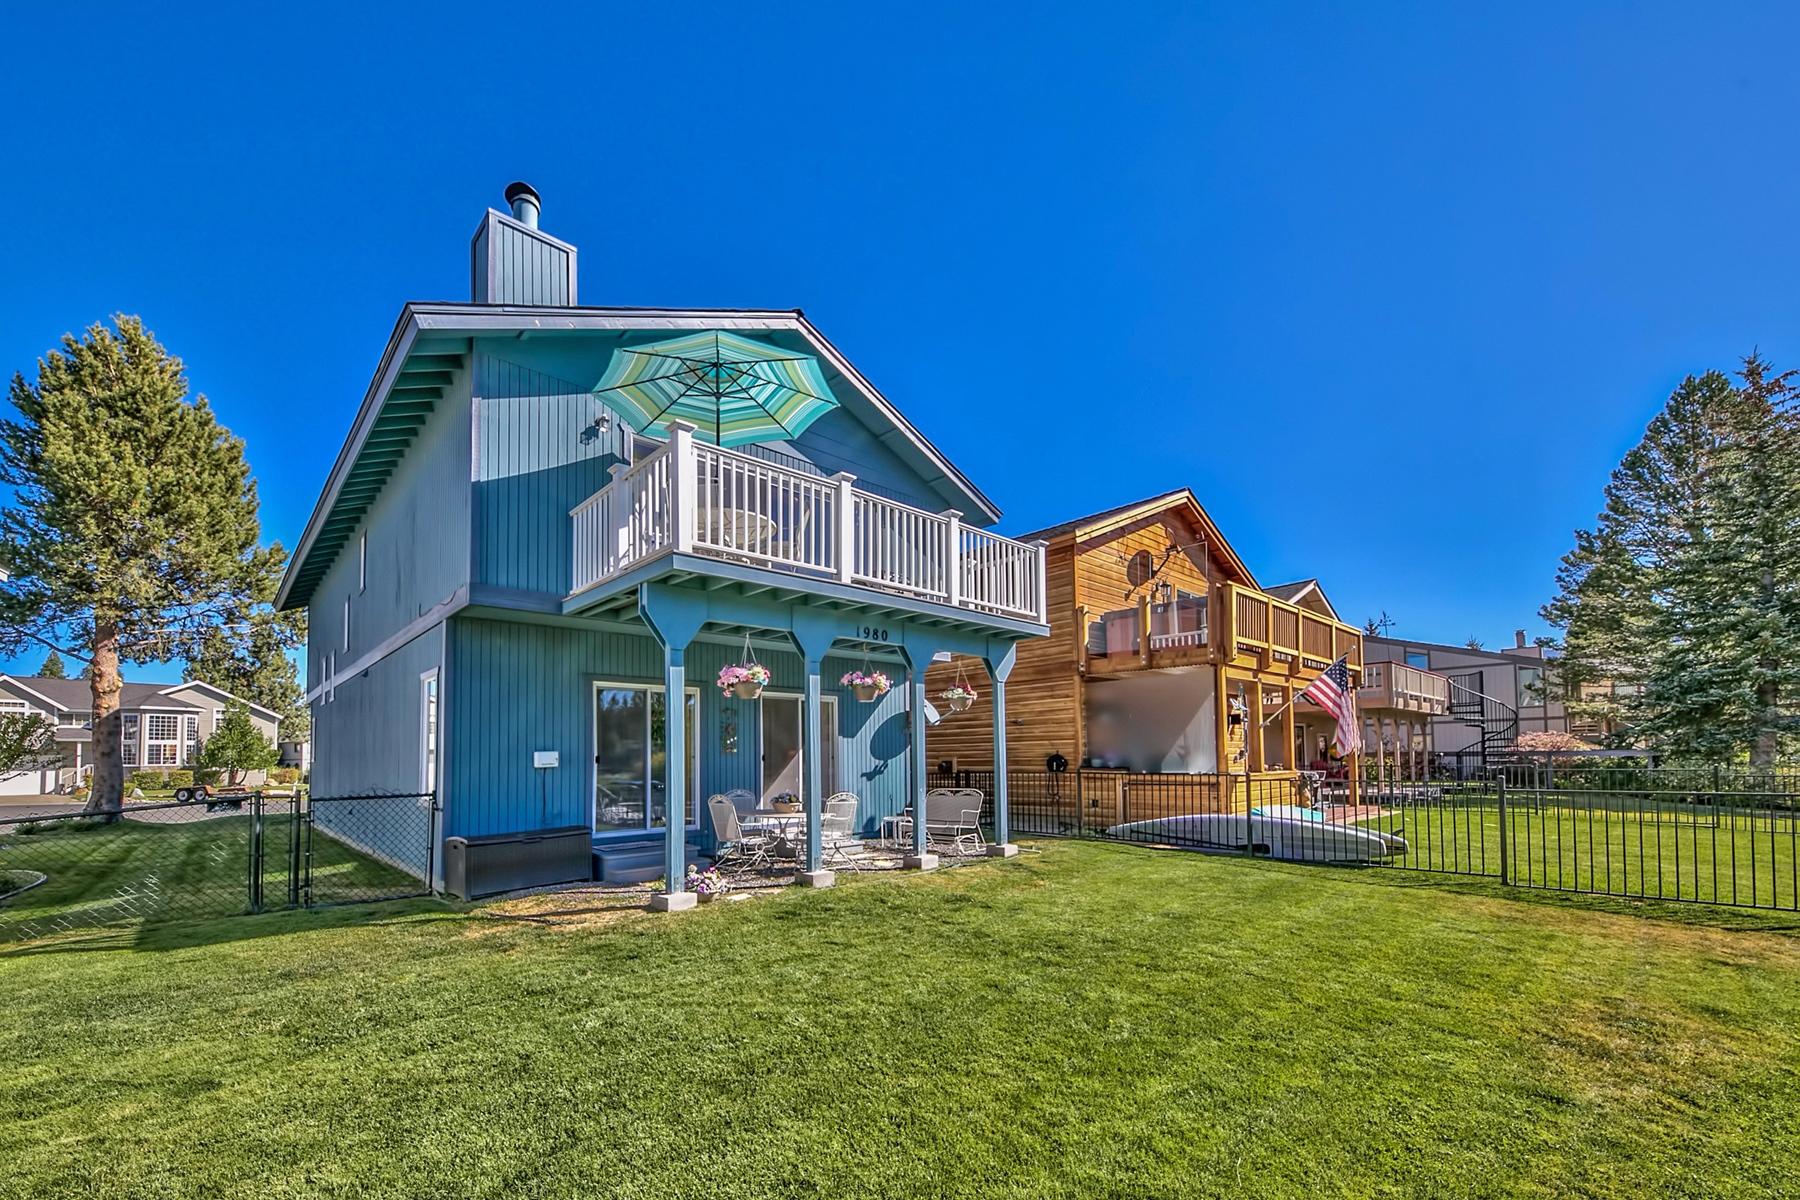 Additional photo for property listing at 1980 Garmish Court, South Lake Tahoe, CA, 96150 1980 Garmish Court South Lake Tahoe, California 96150 United States